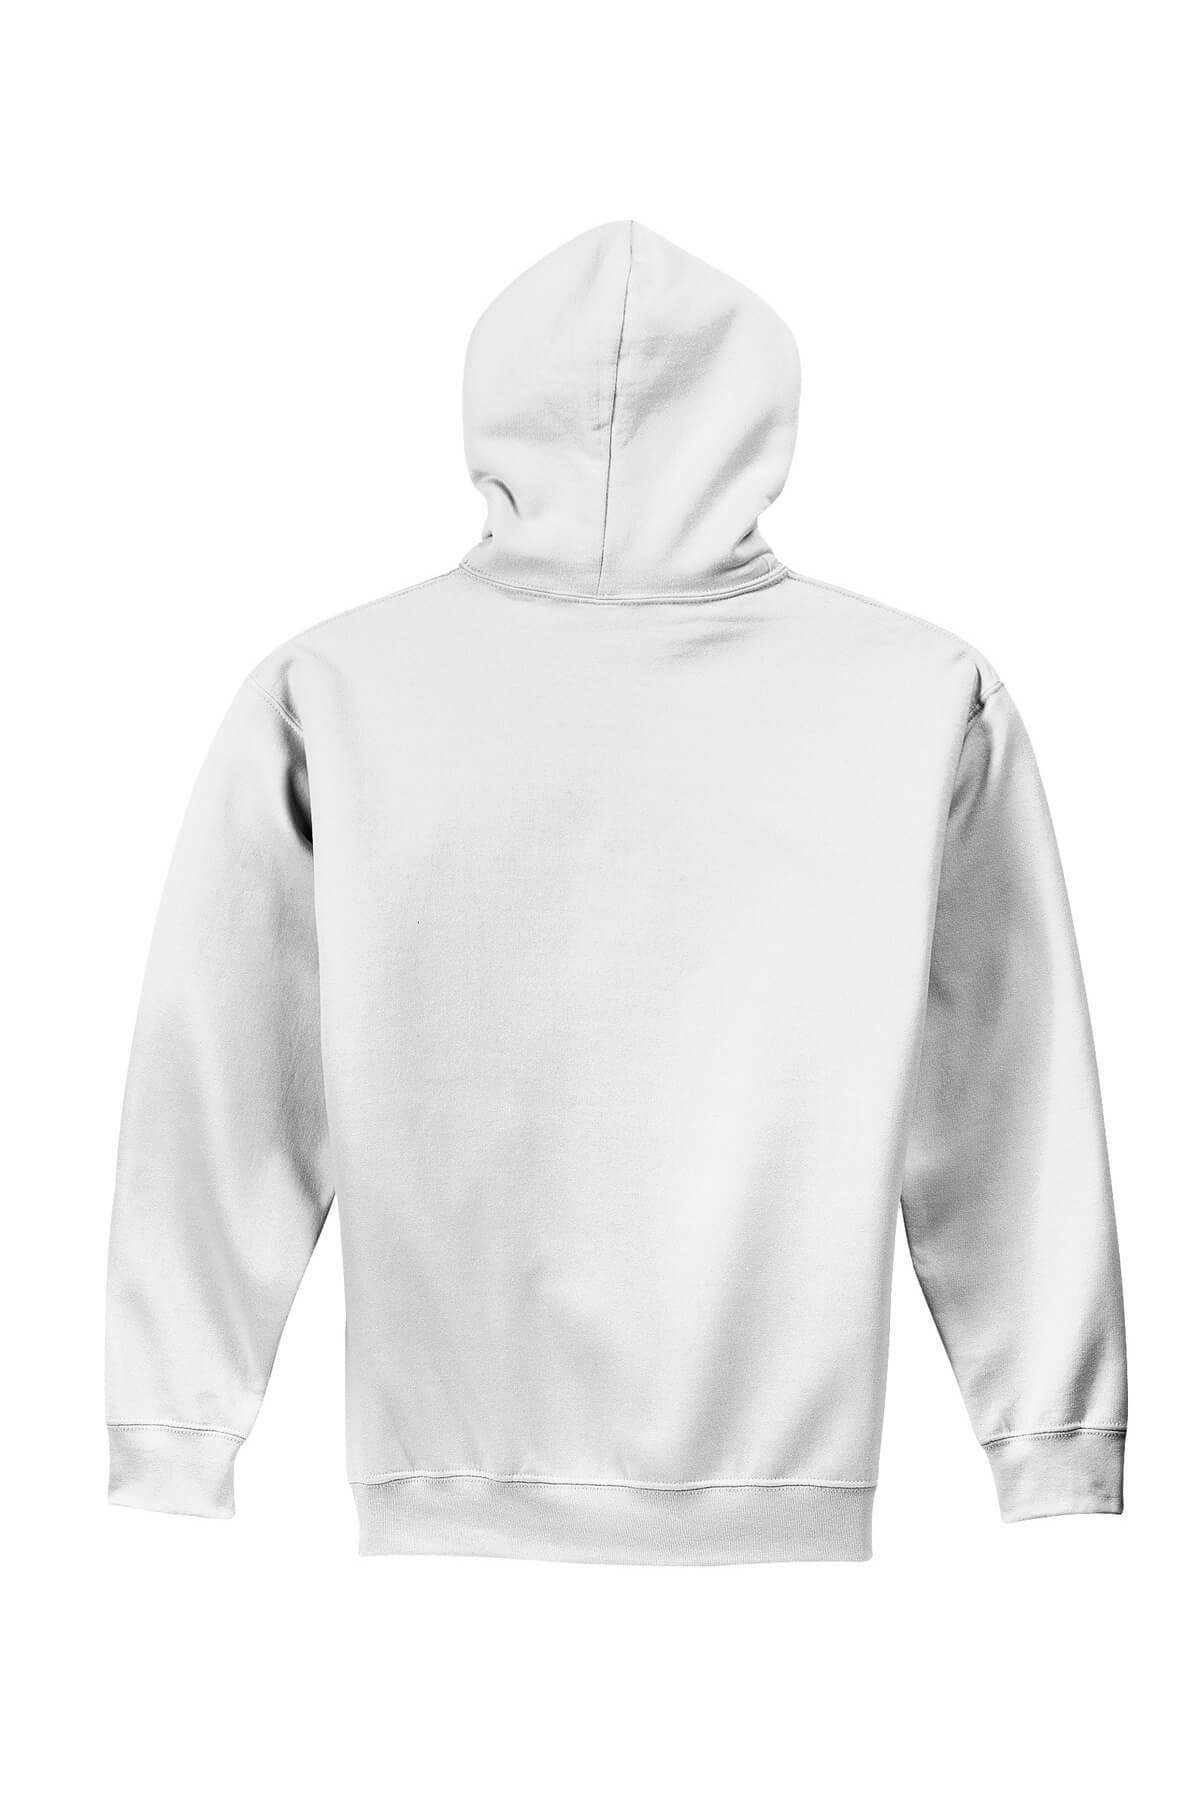 18500-white-6